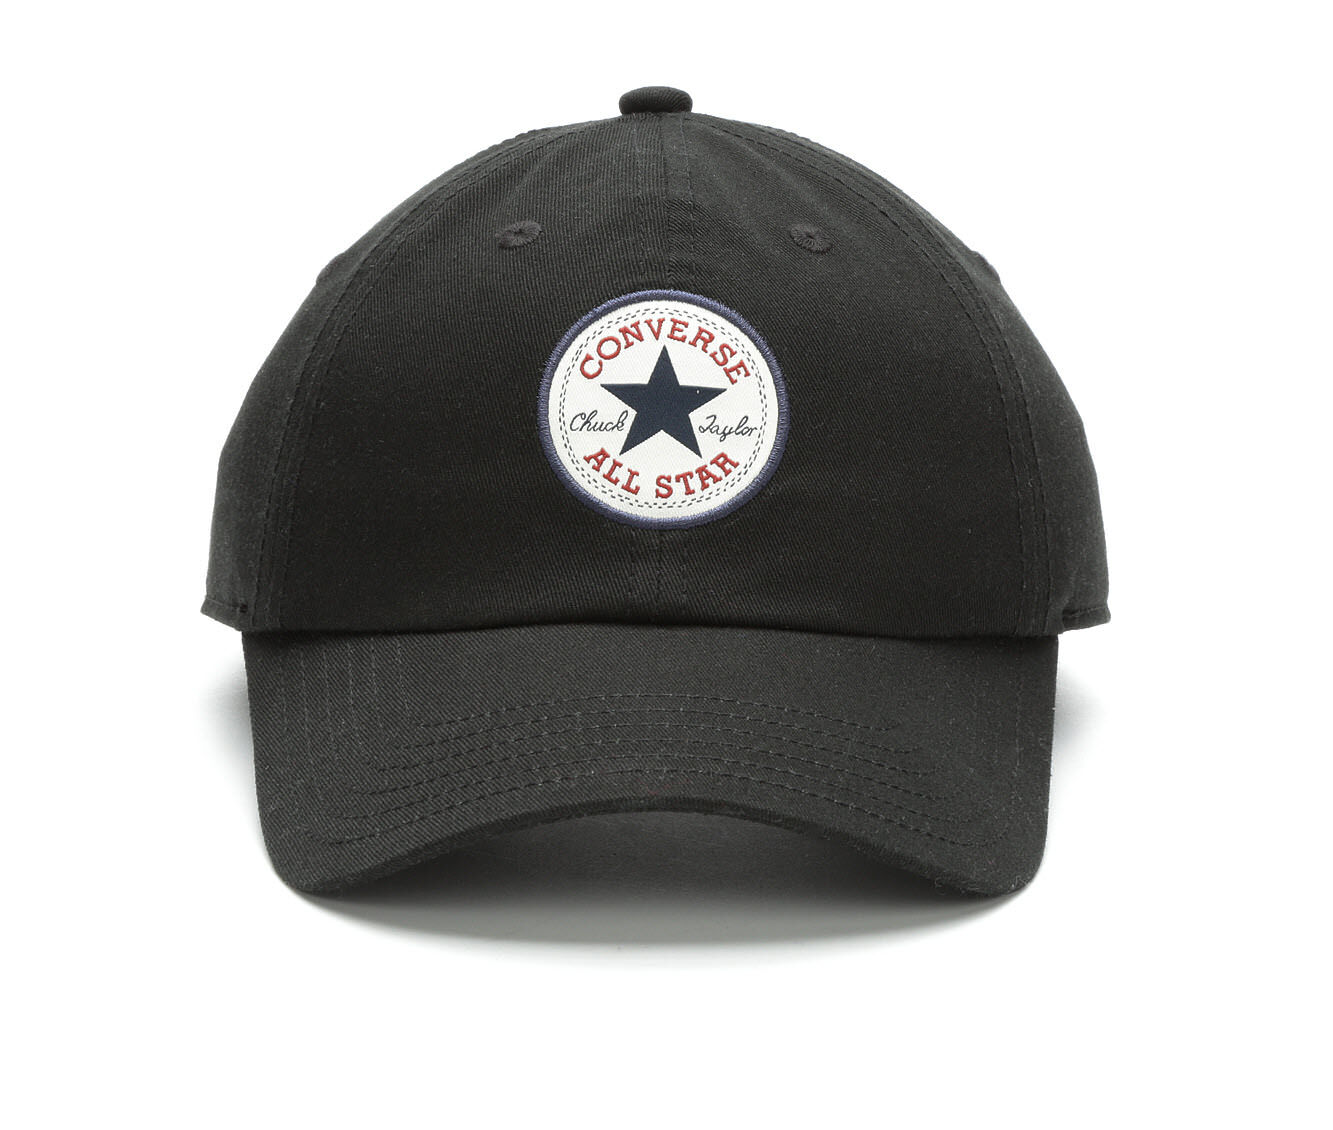 converse baseball hat